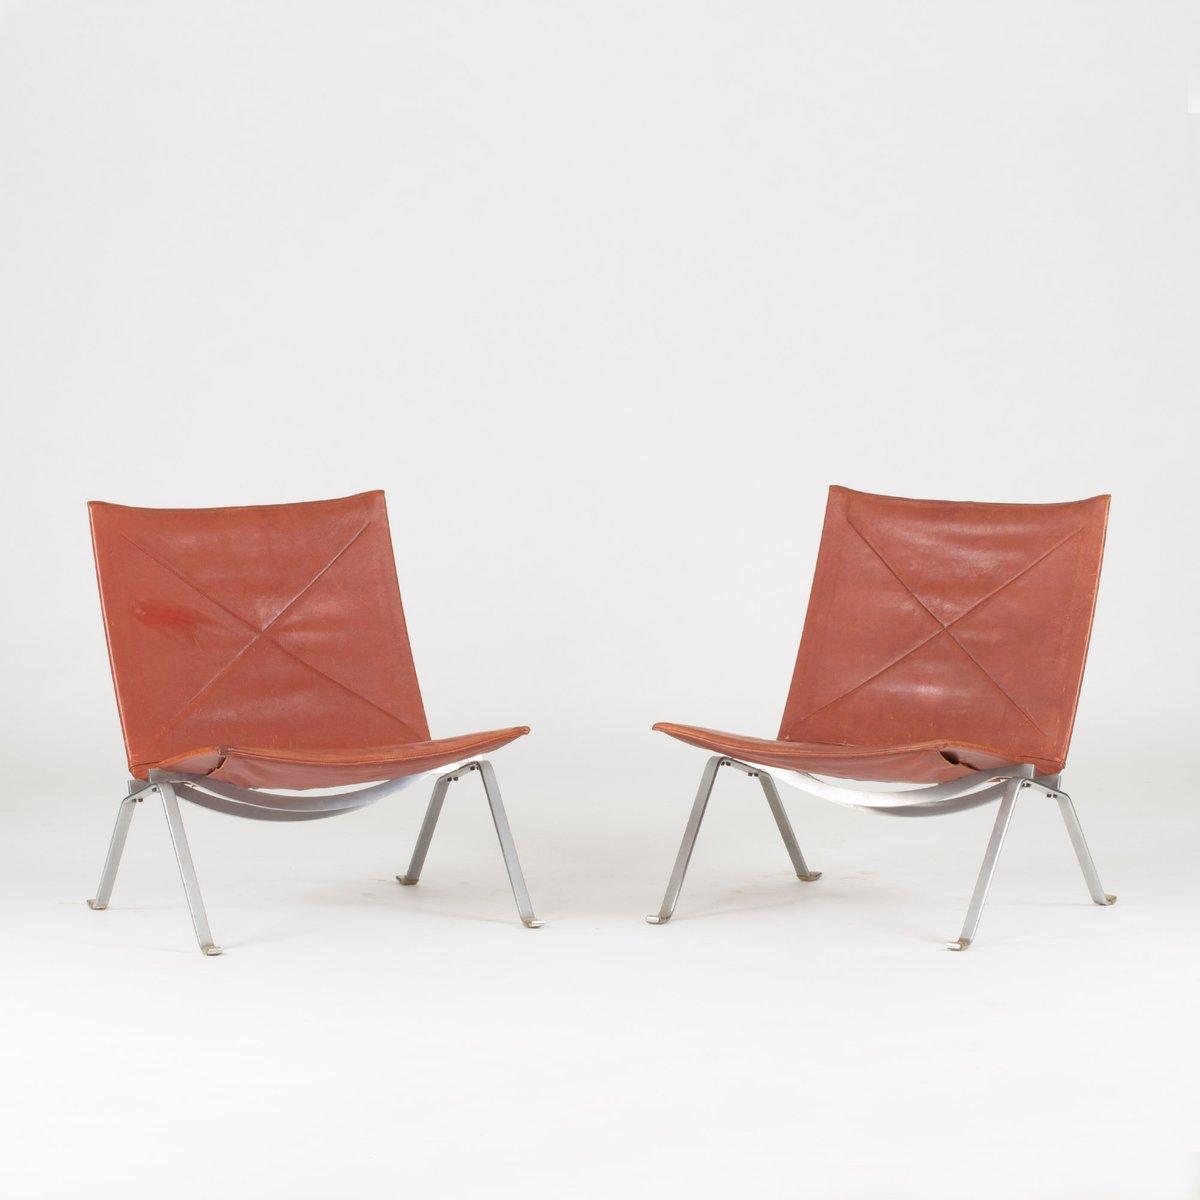 PK 22 Lounge Stühe von Poul Kjæerholm für Kold Christensen, 1950er, 2e...